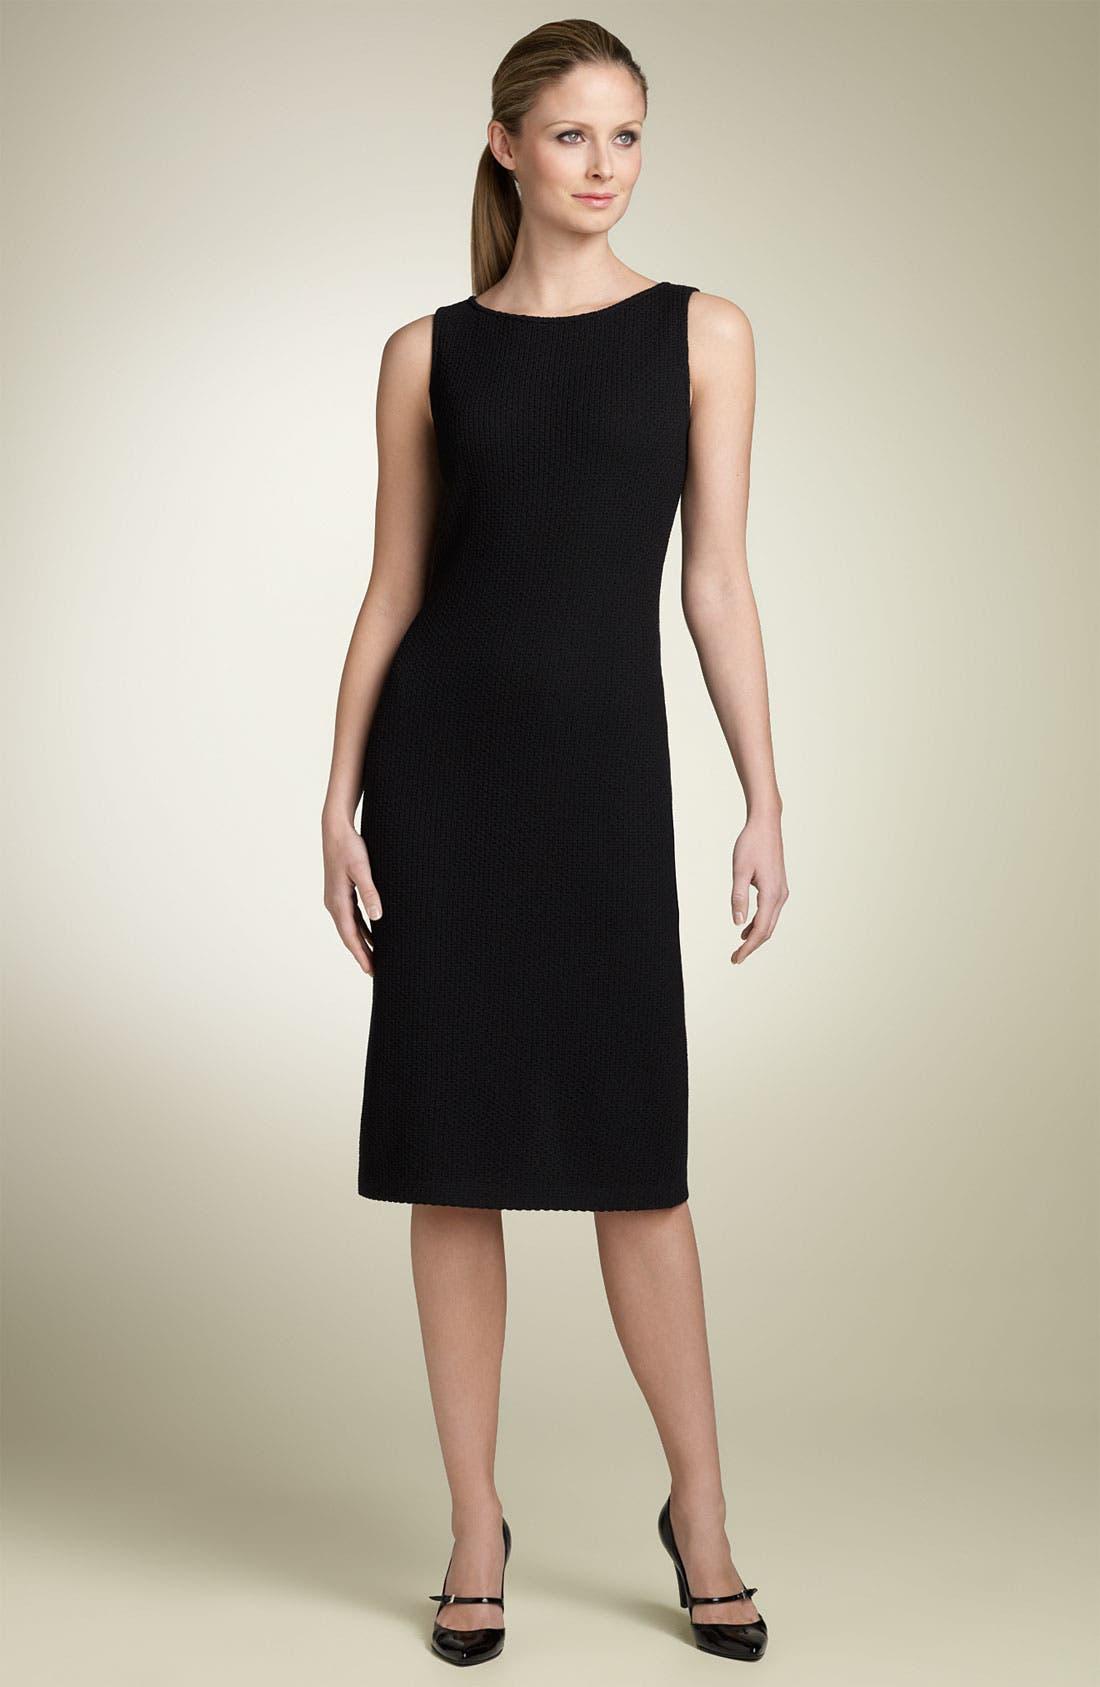 Alternate Image 1 Selected - St. John Collection Caviar Knit Dress